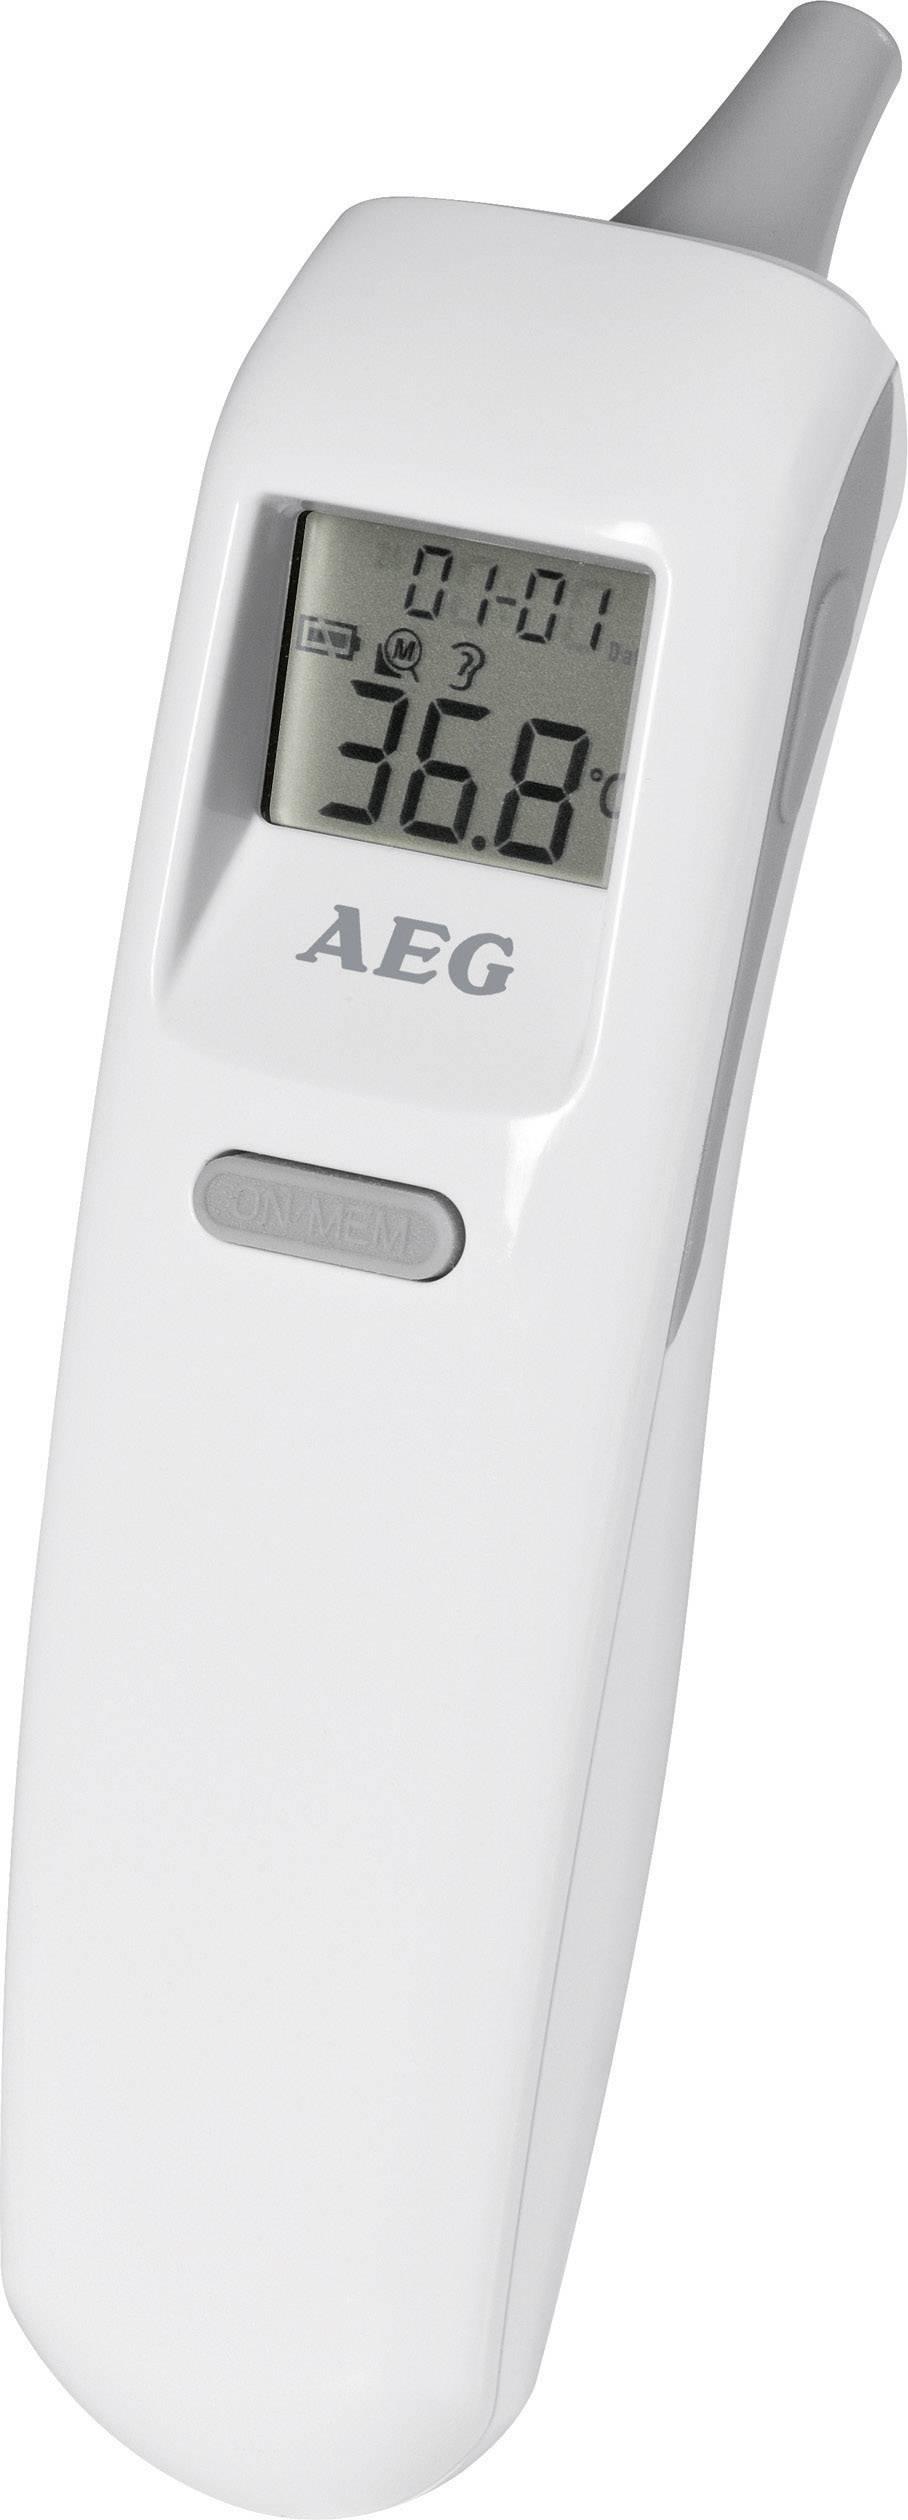 Infračervený teplomer AEG FT 4919 450019